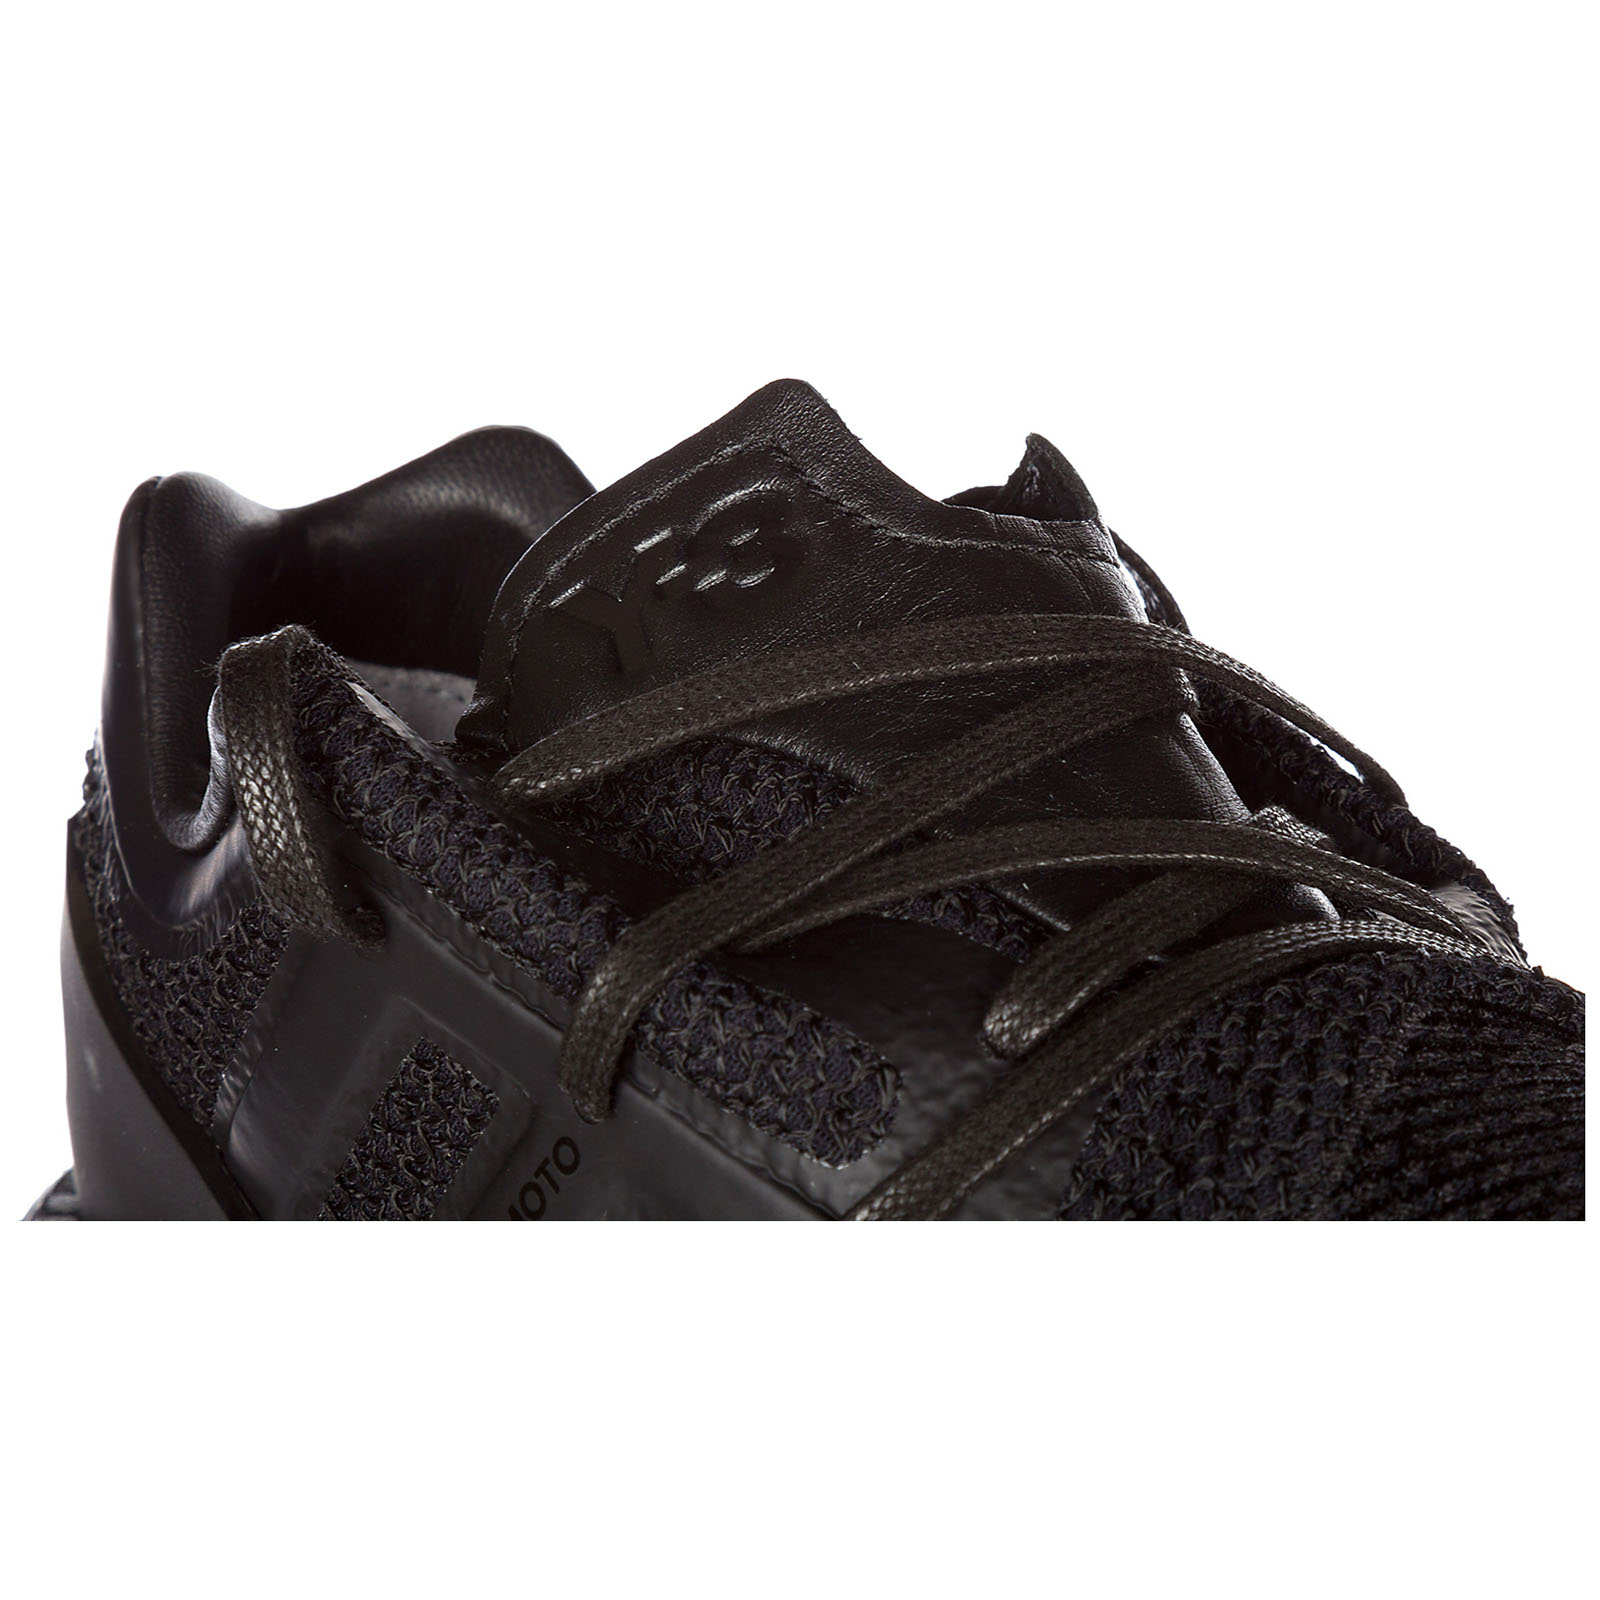 cfca08b2b9d2 ... Men s shoes trainers sneakers yohji yamamoto pureboost